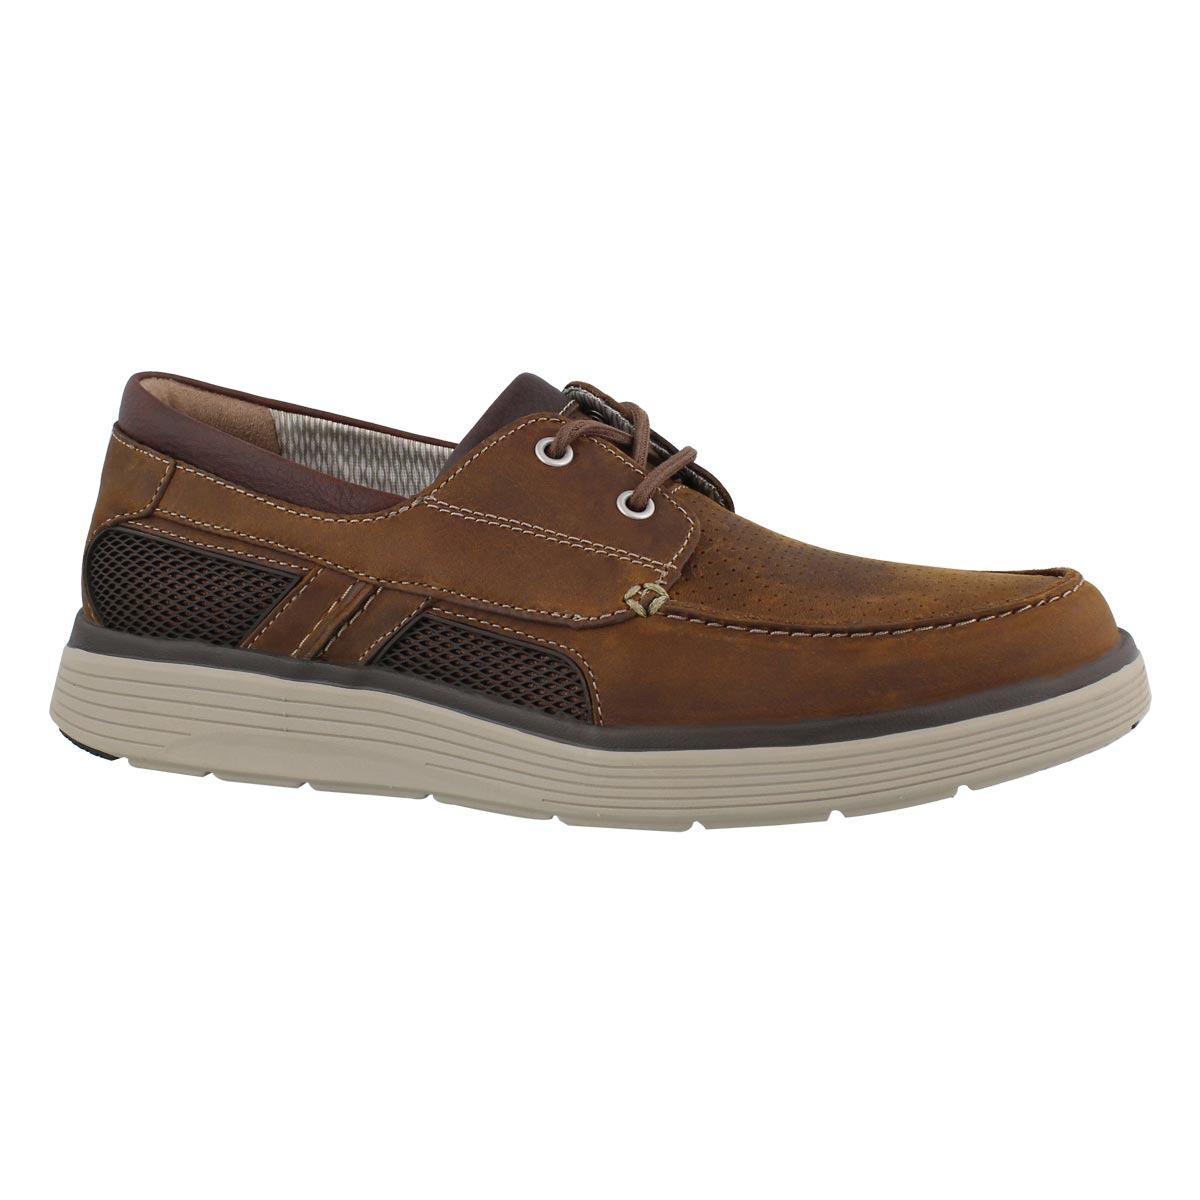 Men's UN ABODE STEP dark tan boat shoes